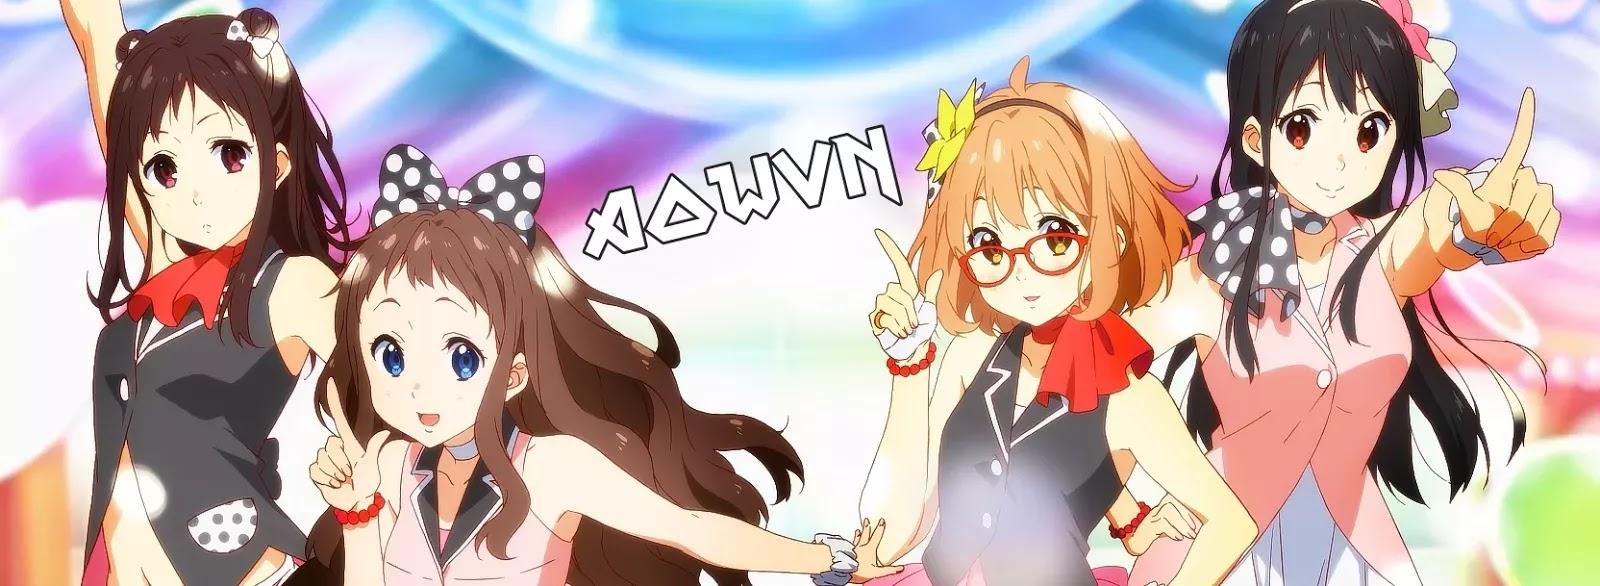 kyoukai2 aowvn - [ Anime 3gp ] Kyoukai No Katana + OVA + Movie | Vietsub - Siêu Phẩm Là Đây